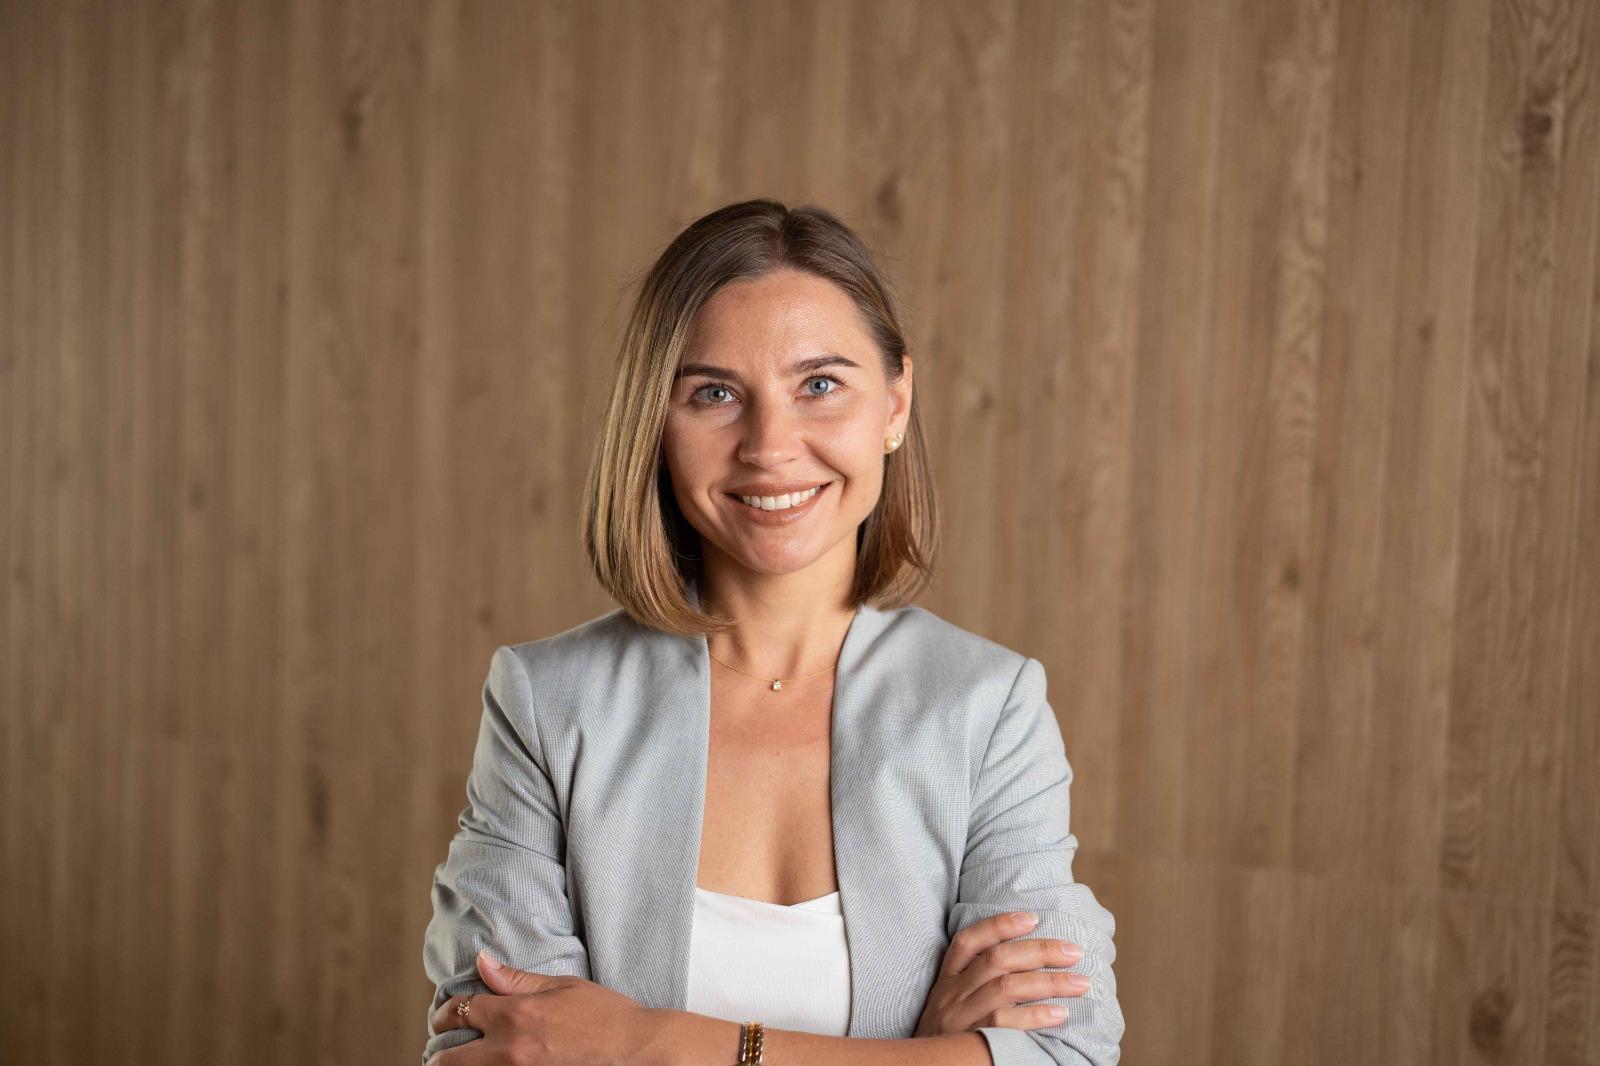 Julia Papkova